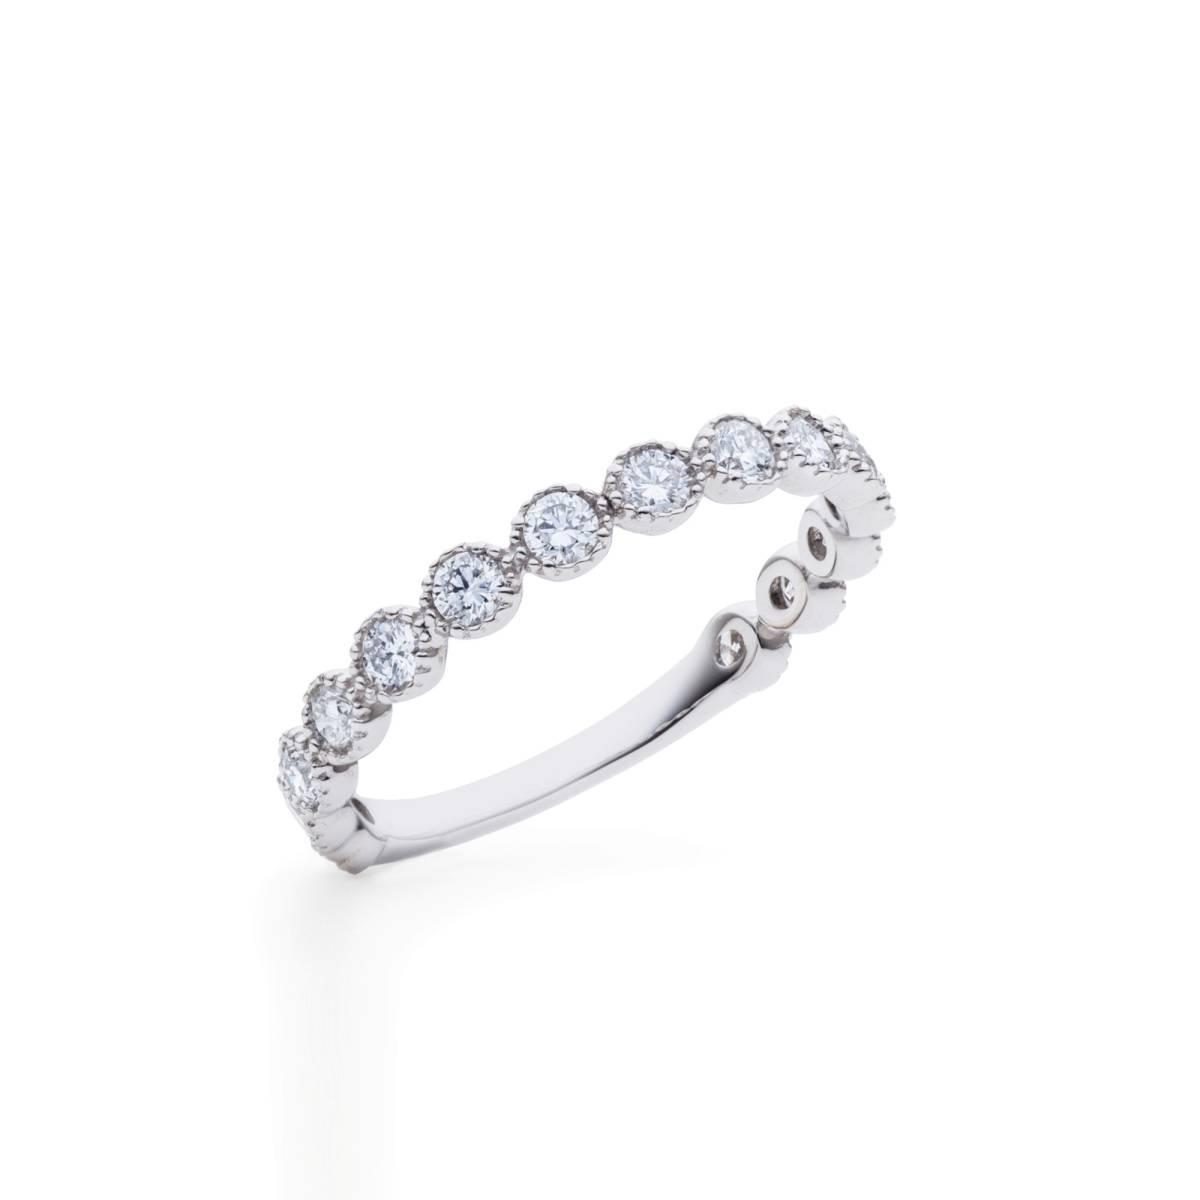 【size8号】ハード プラチナ pt900 天然diamond 0.53ct H&C 3/4 エタニティ リング【鑑別書付】_大変人気のあるデザインです!